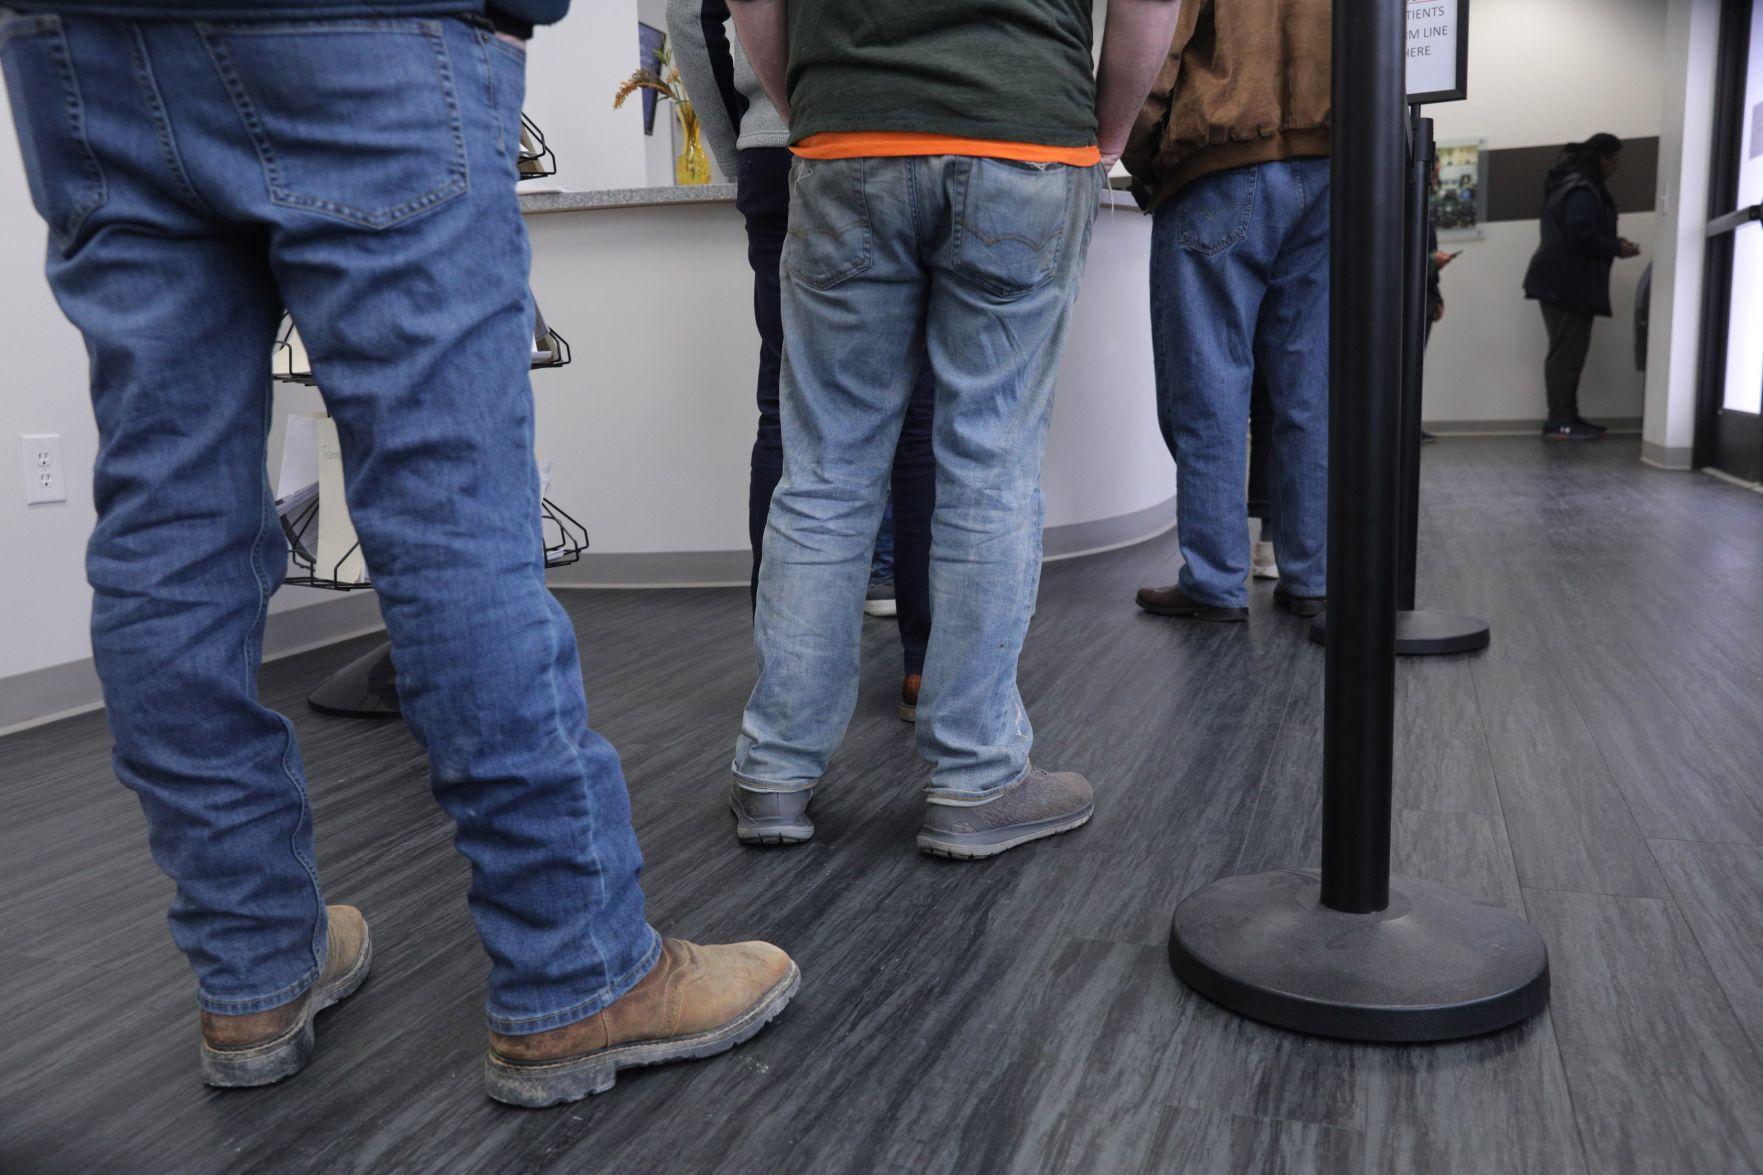 stltoday.com - Nassim Benchaabane - With marijuana testing soon underway, medical pot expected to hit Missouri shelves this fall